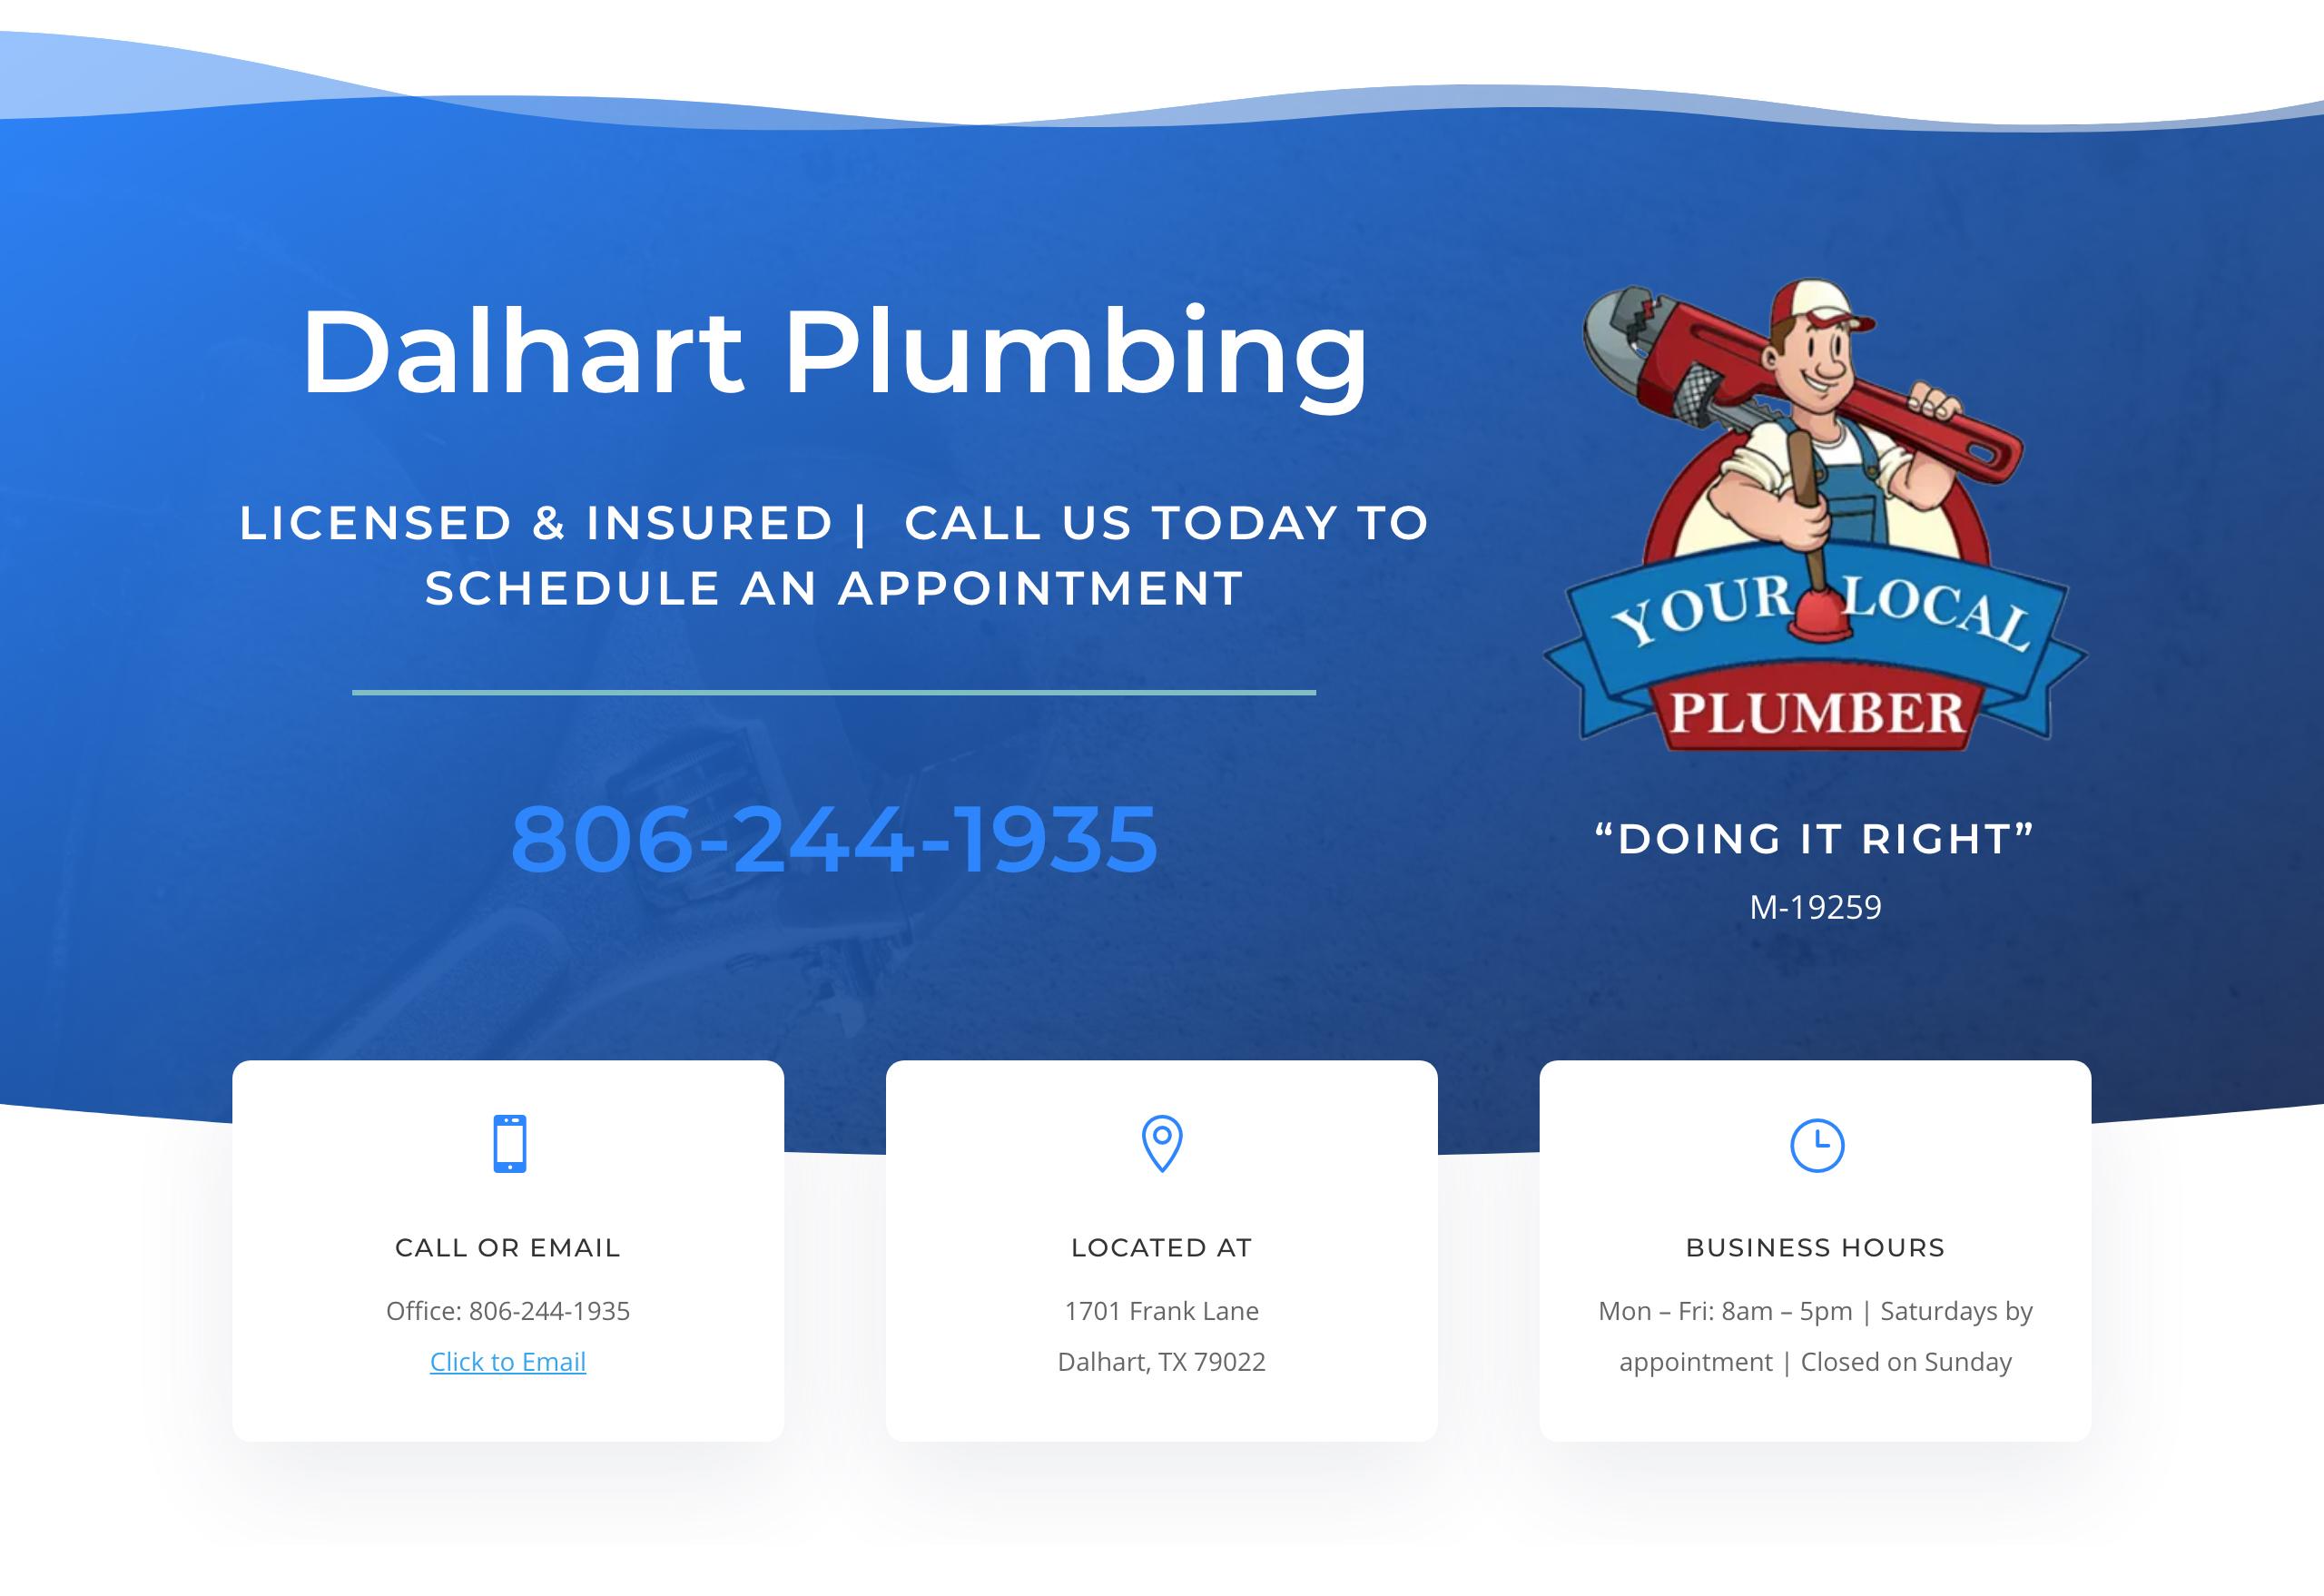 Dalhart plumbing site